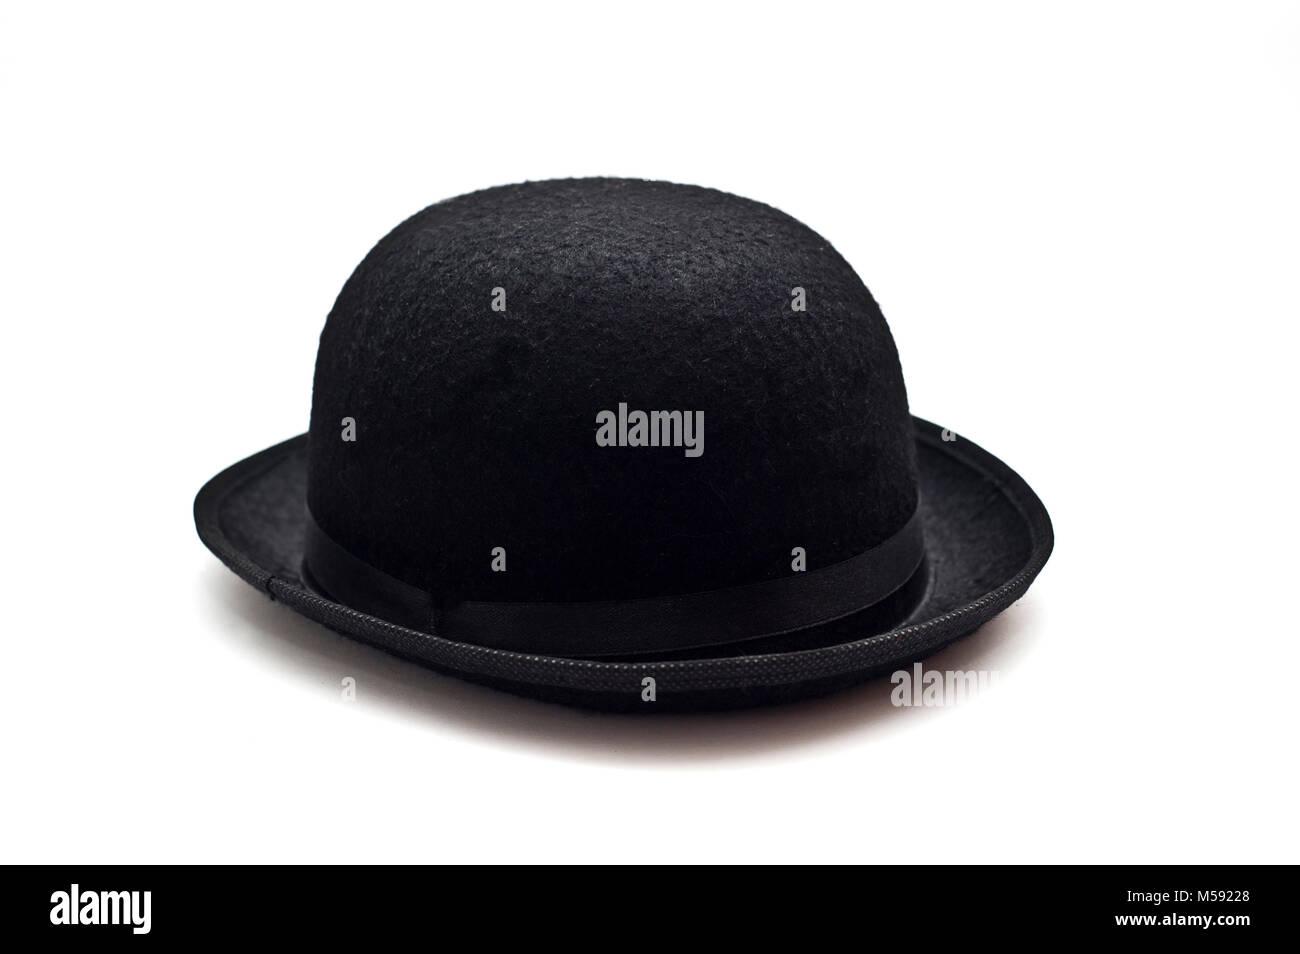 31134723a26 Felt Hat Cut Out Stock Images   Pictures - Alamy